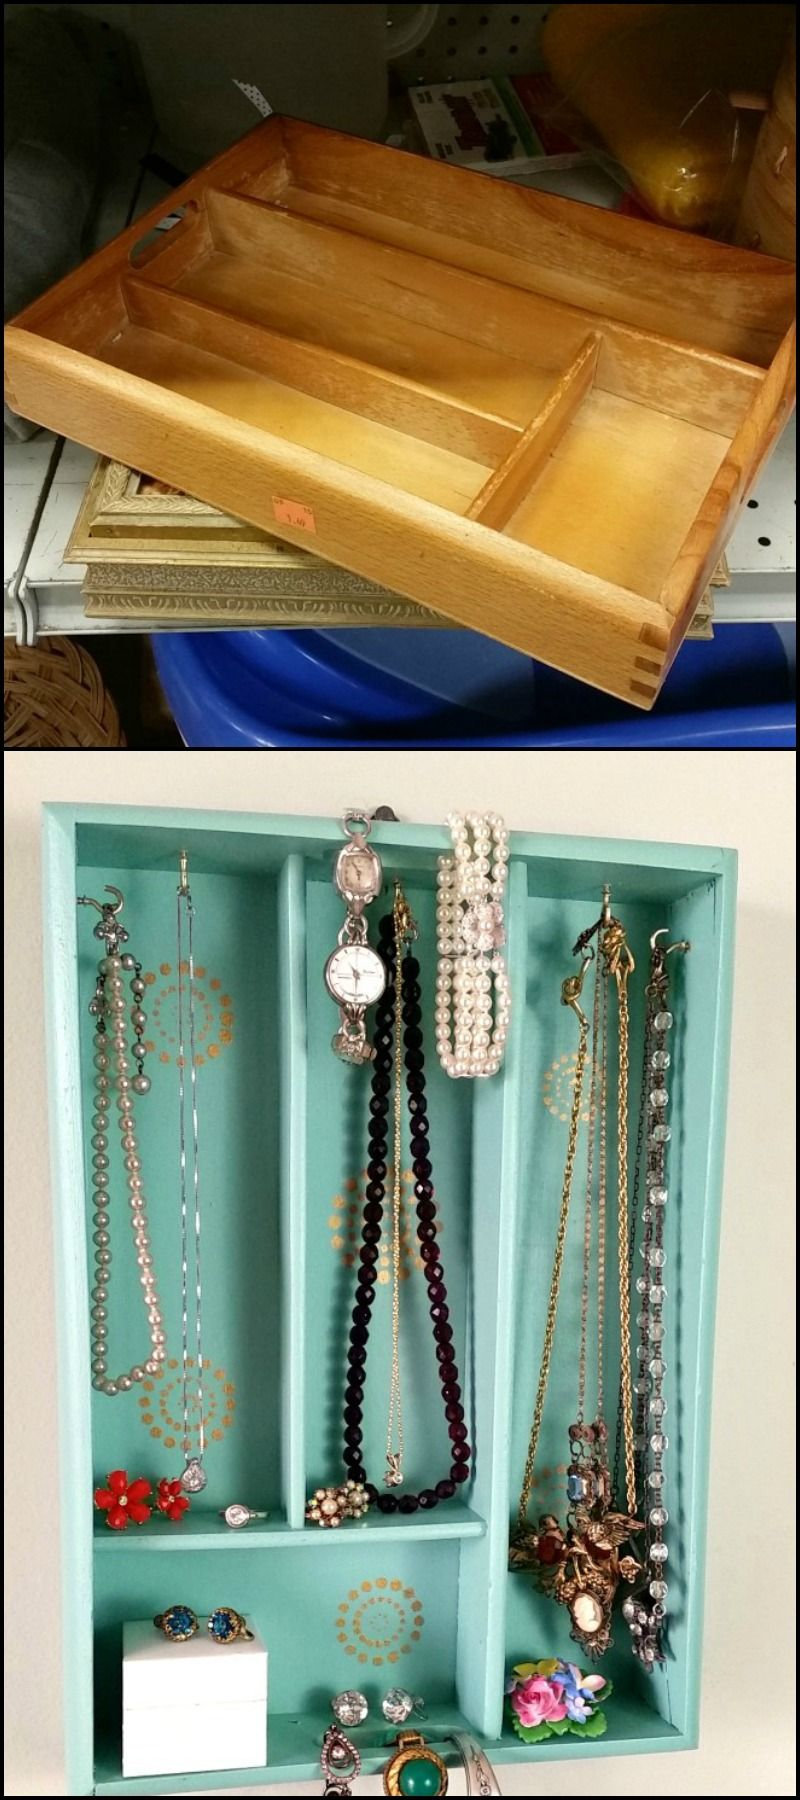 Turn a cutlery tray into a jewelry organizer Silverware tray